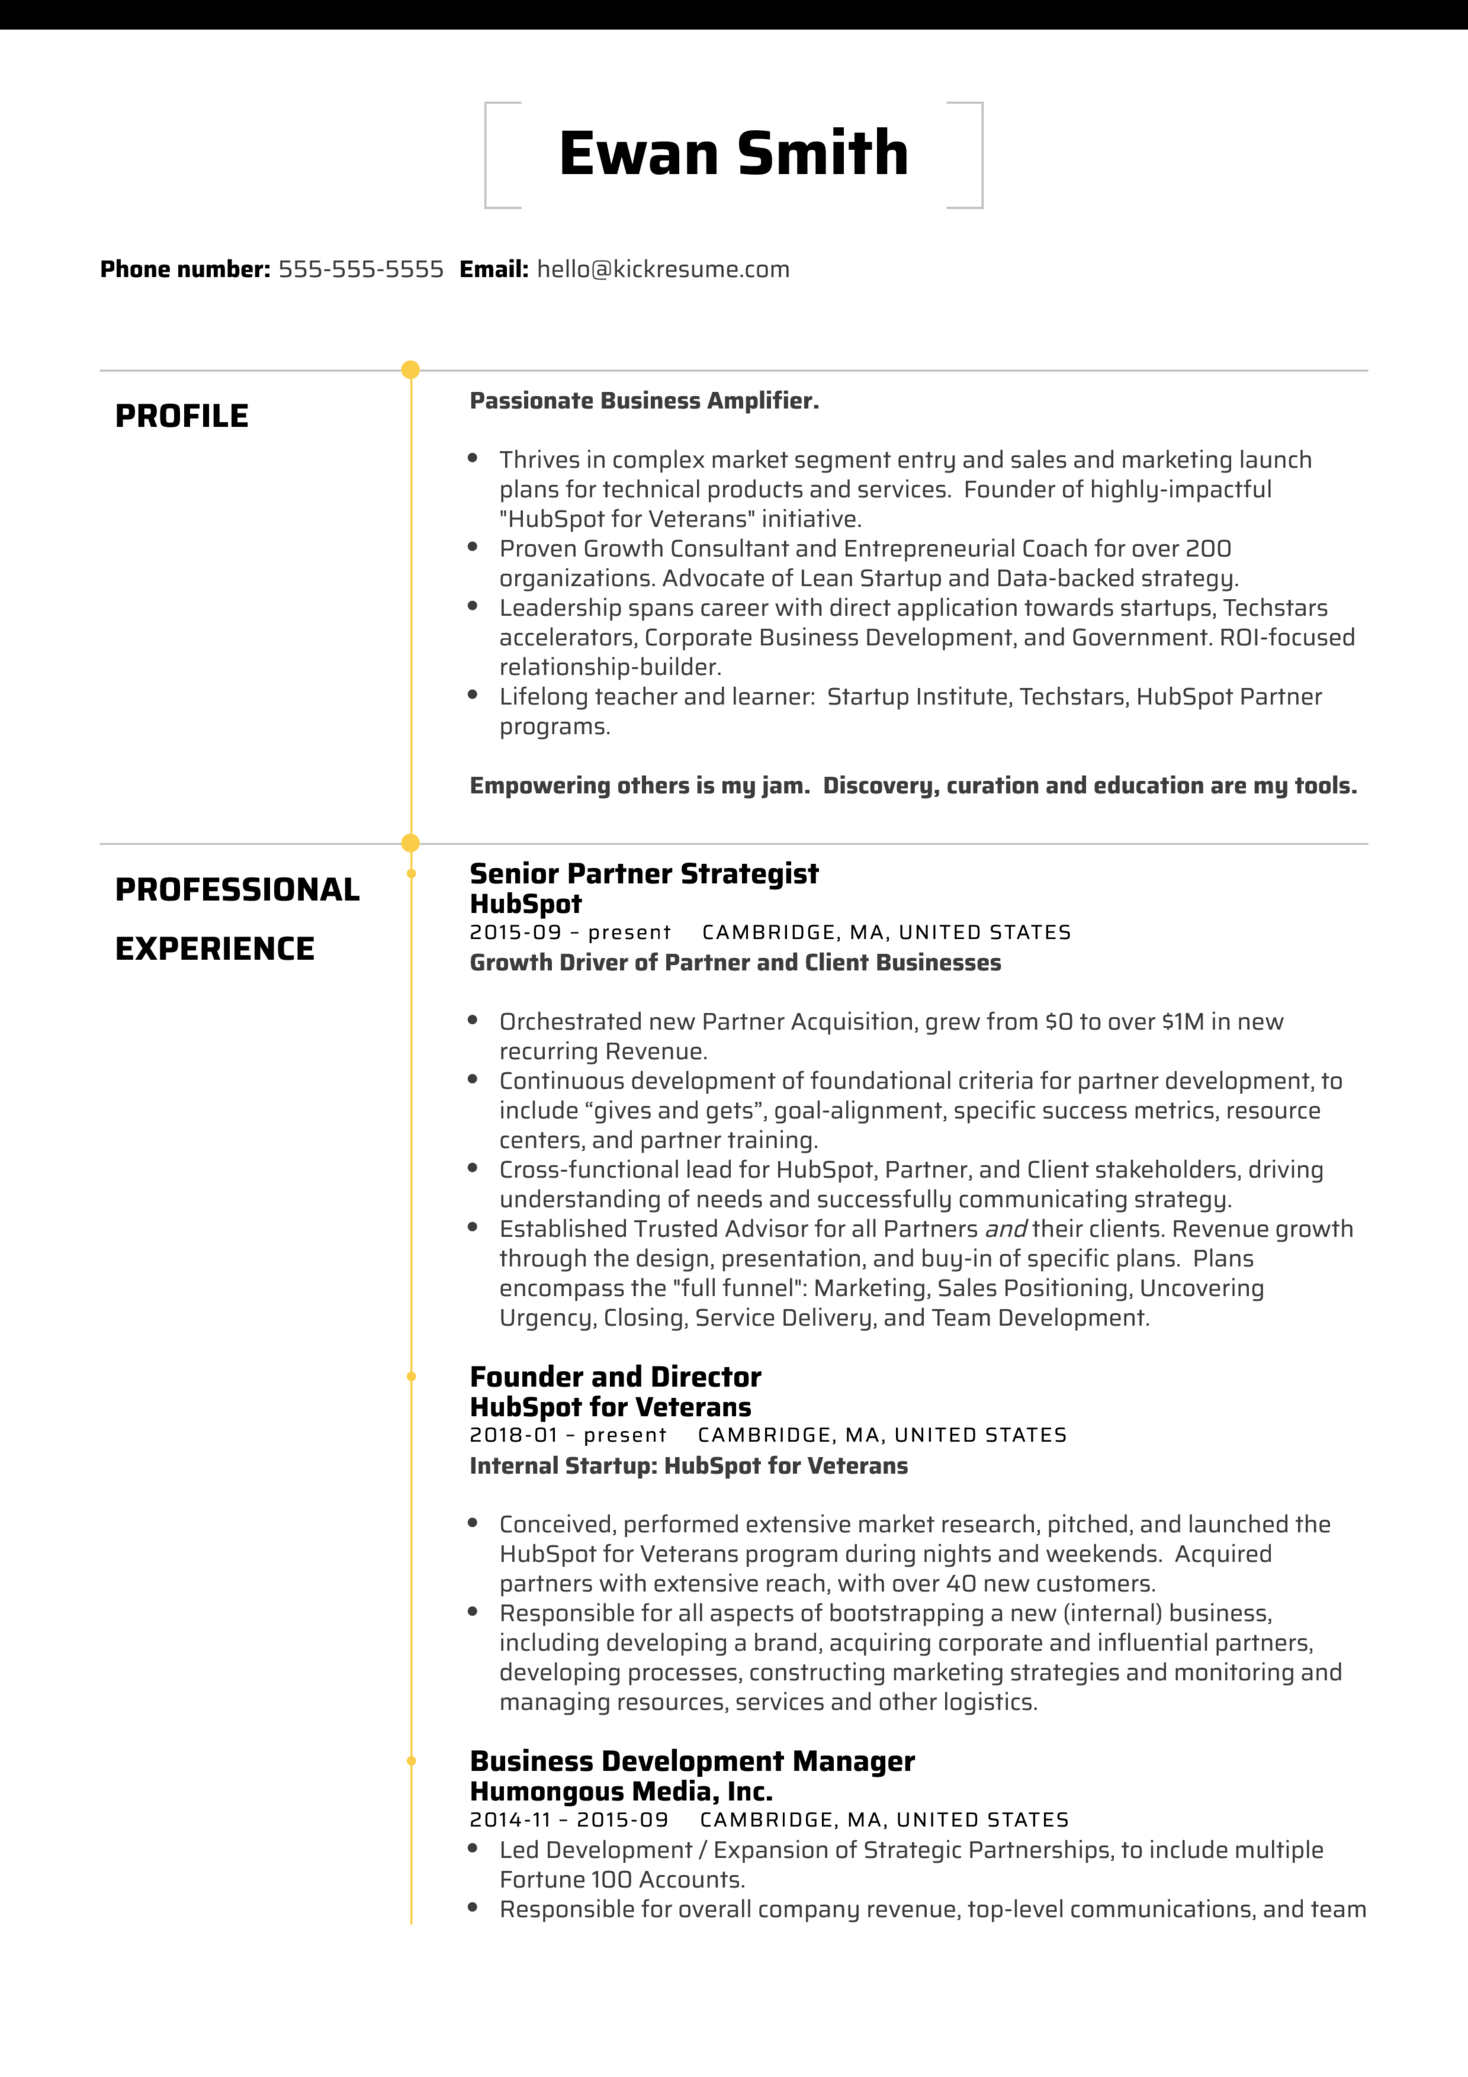 HubSpot Director of Business Development Resume Sample (Part 1)